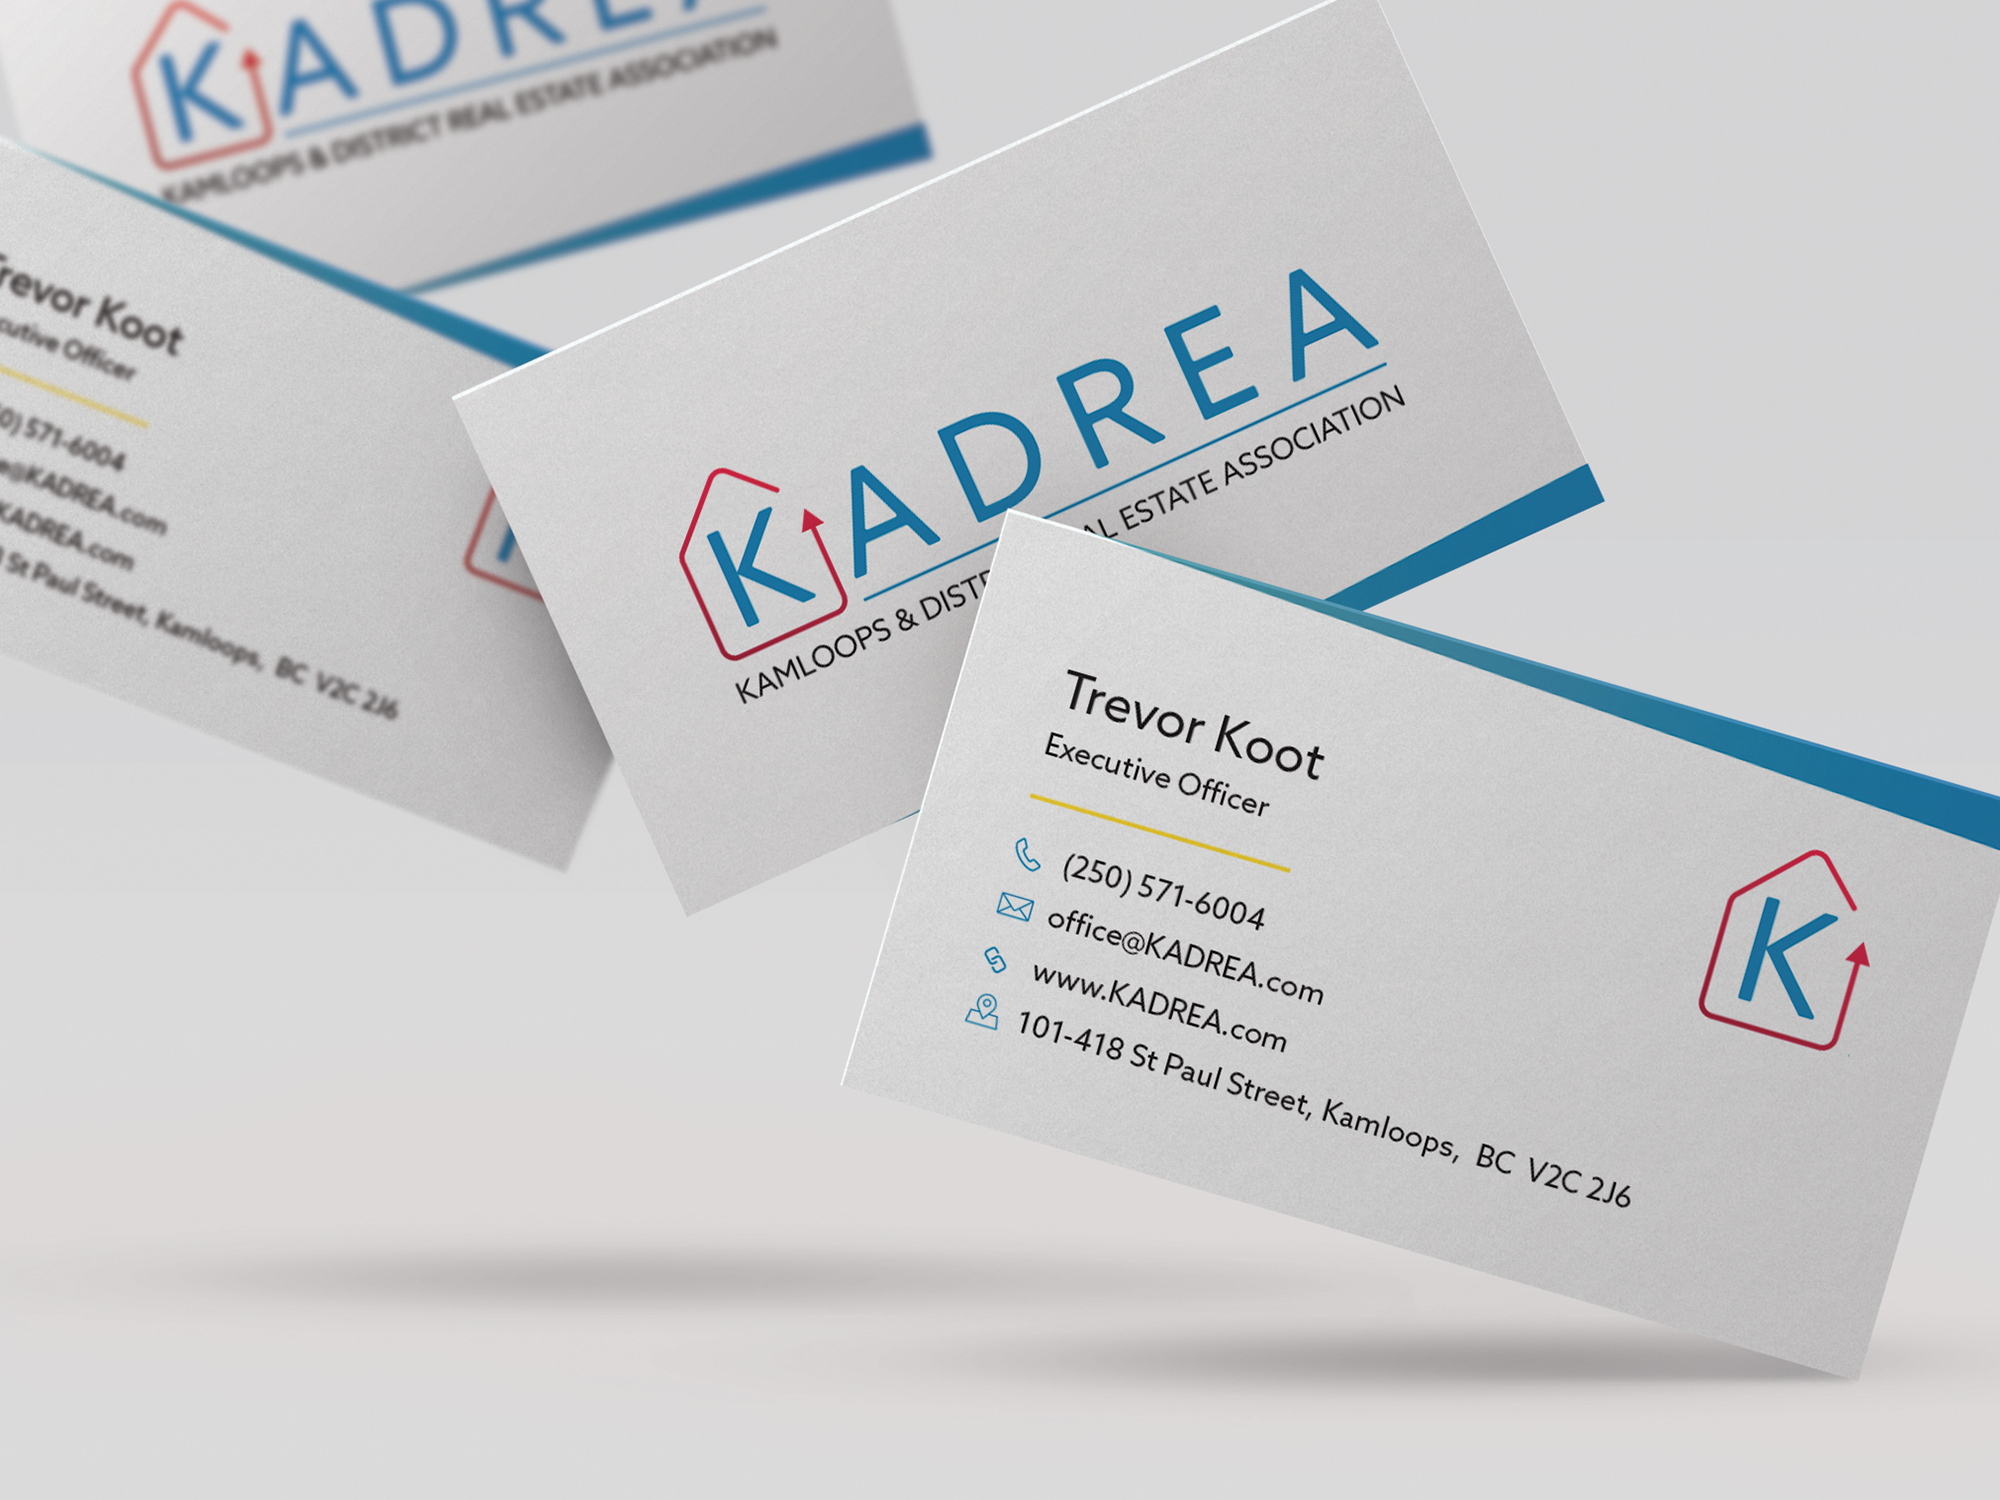 KADREA's new business card design.